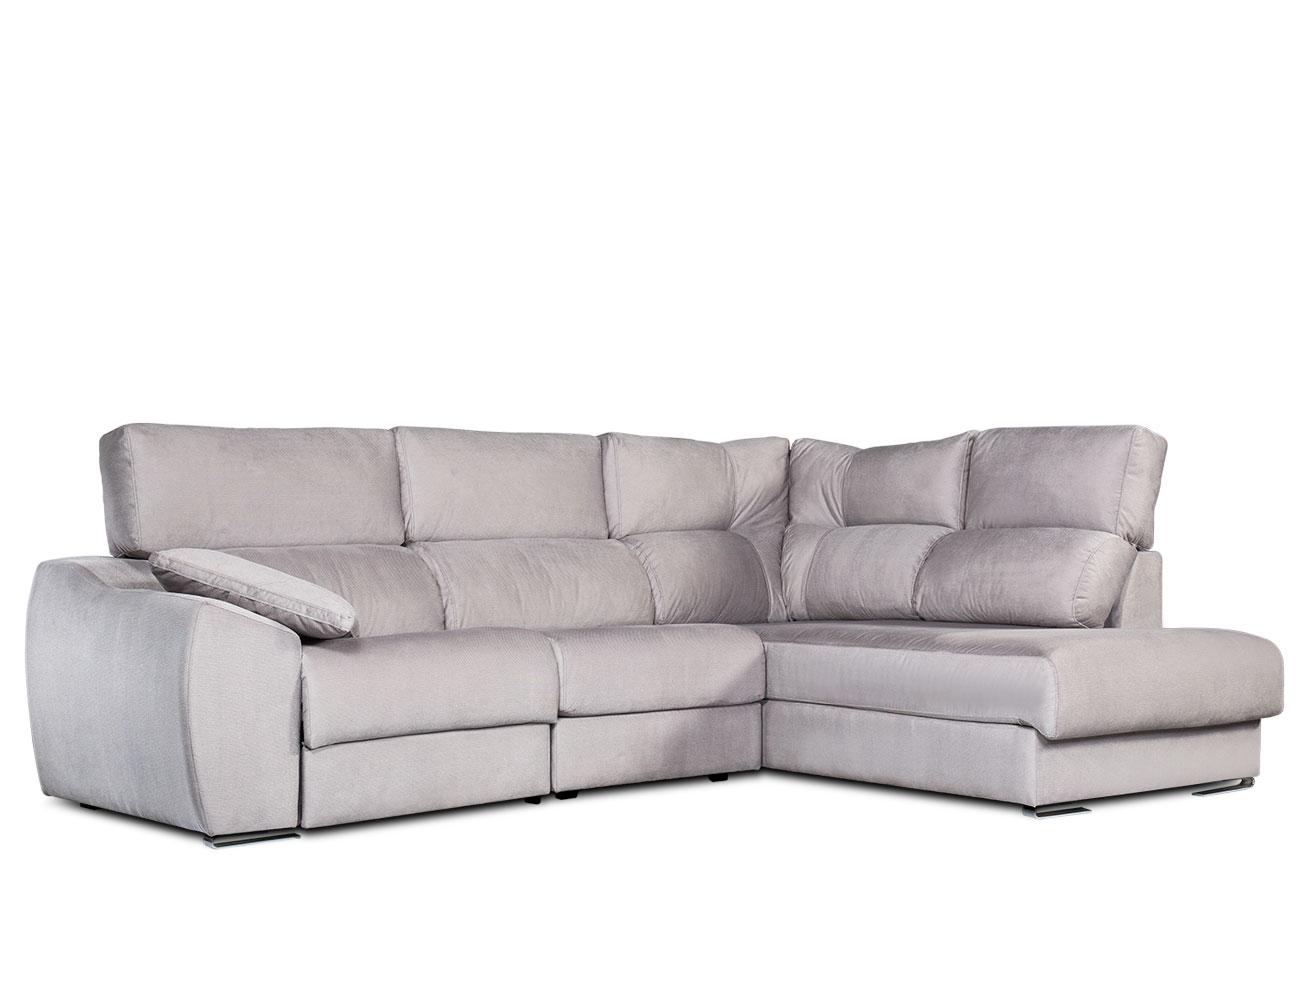 Sofa chaiselongue rincon electrico8